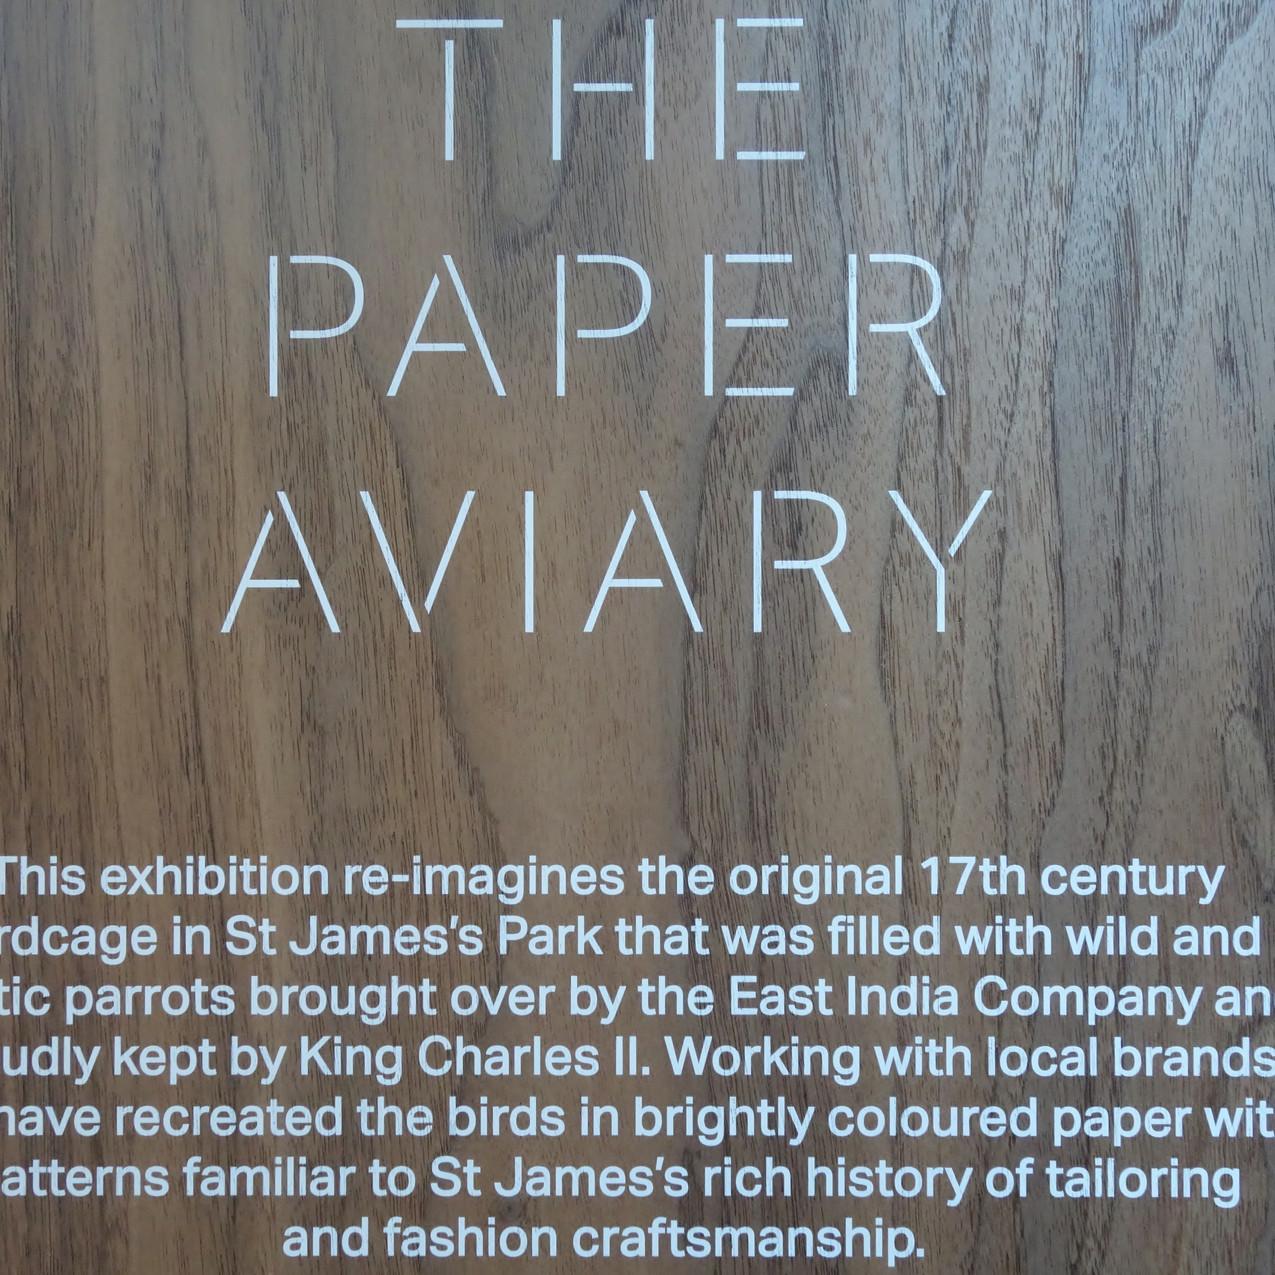 The Paper Aviary